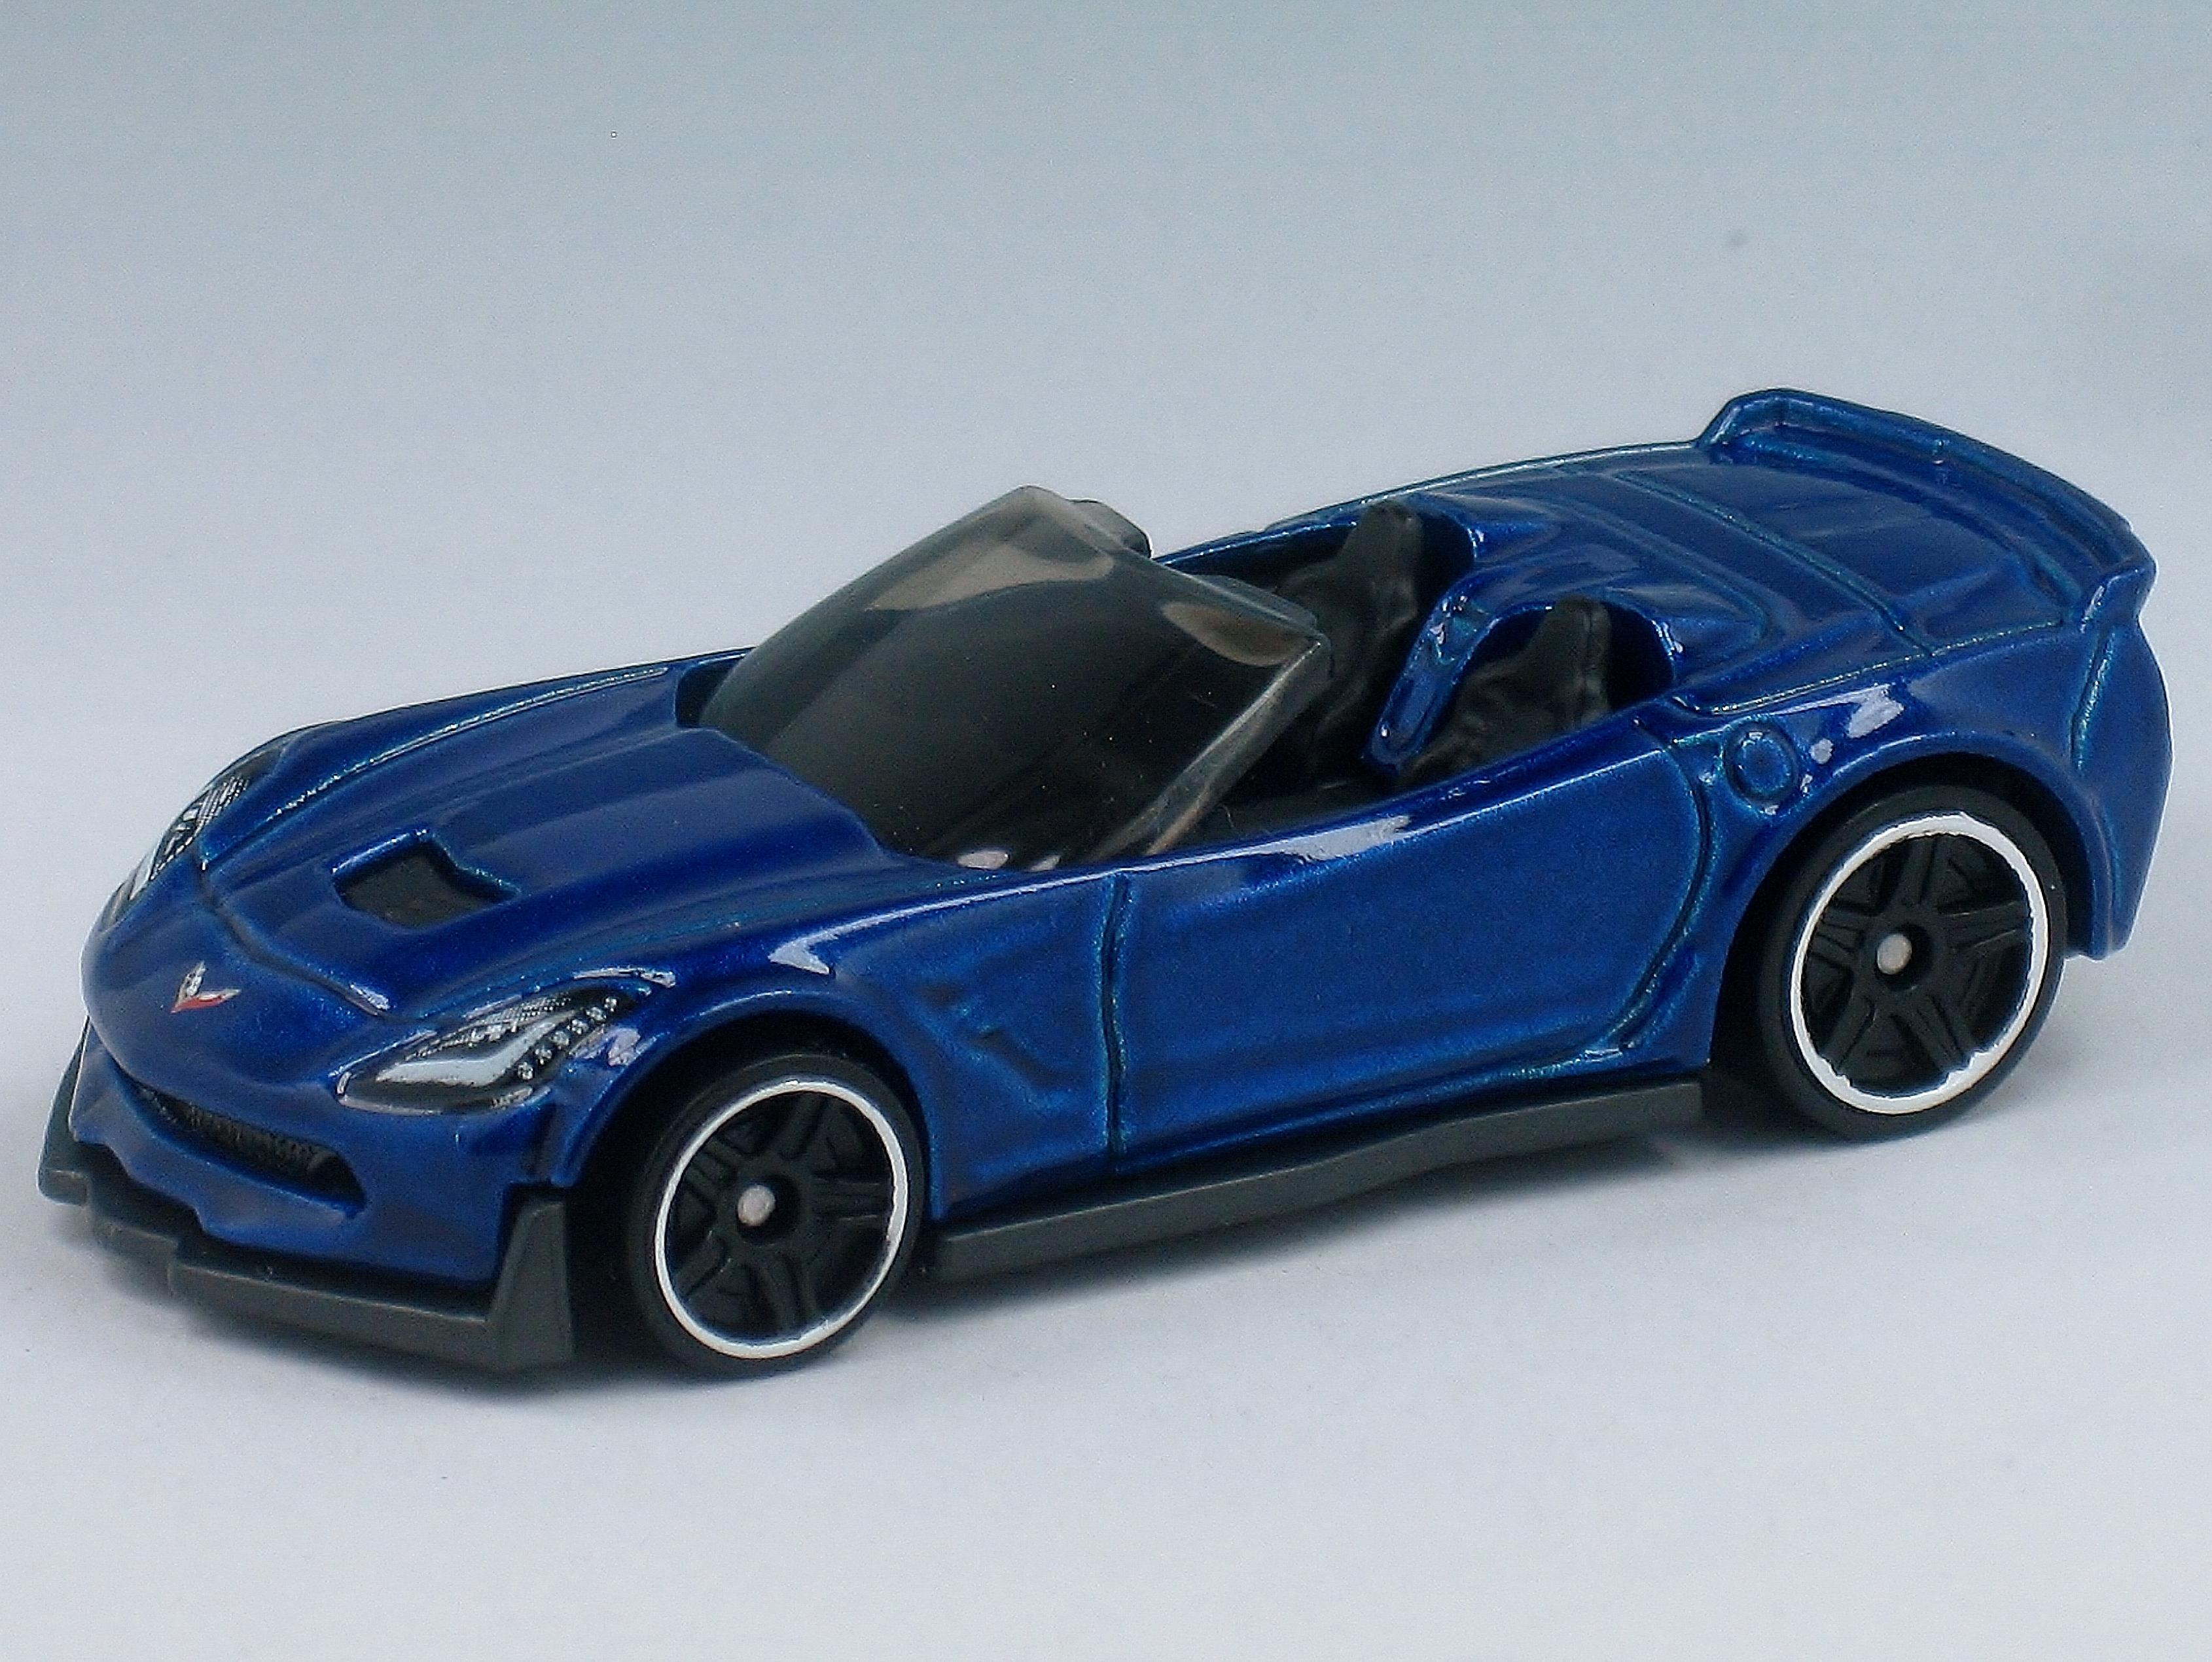 Charming Corvette C7 Z06 Convertible